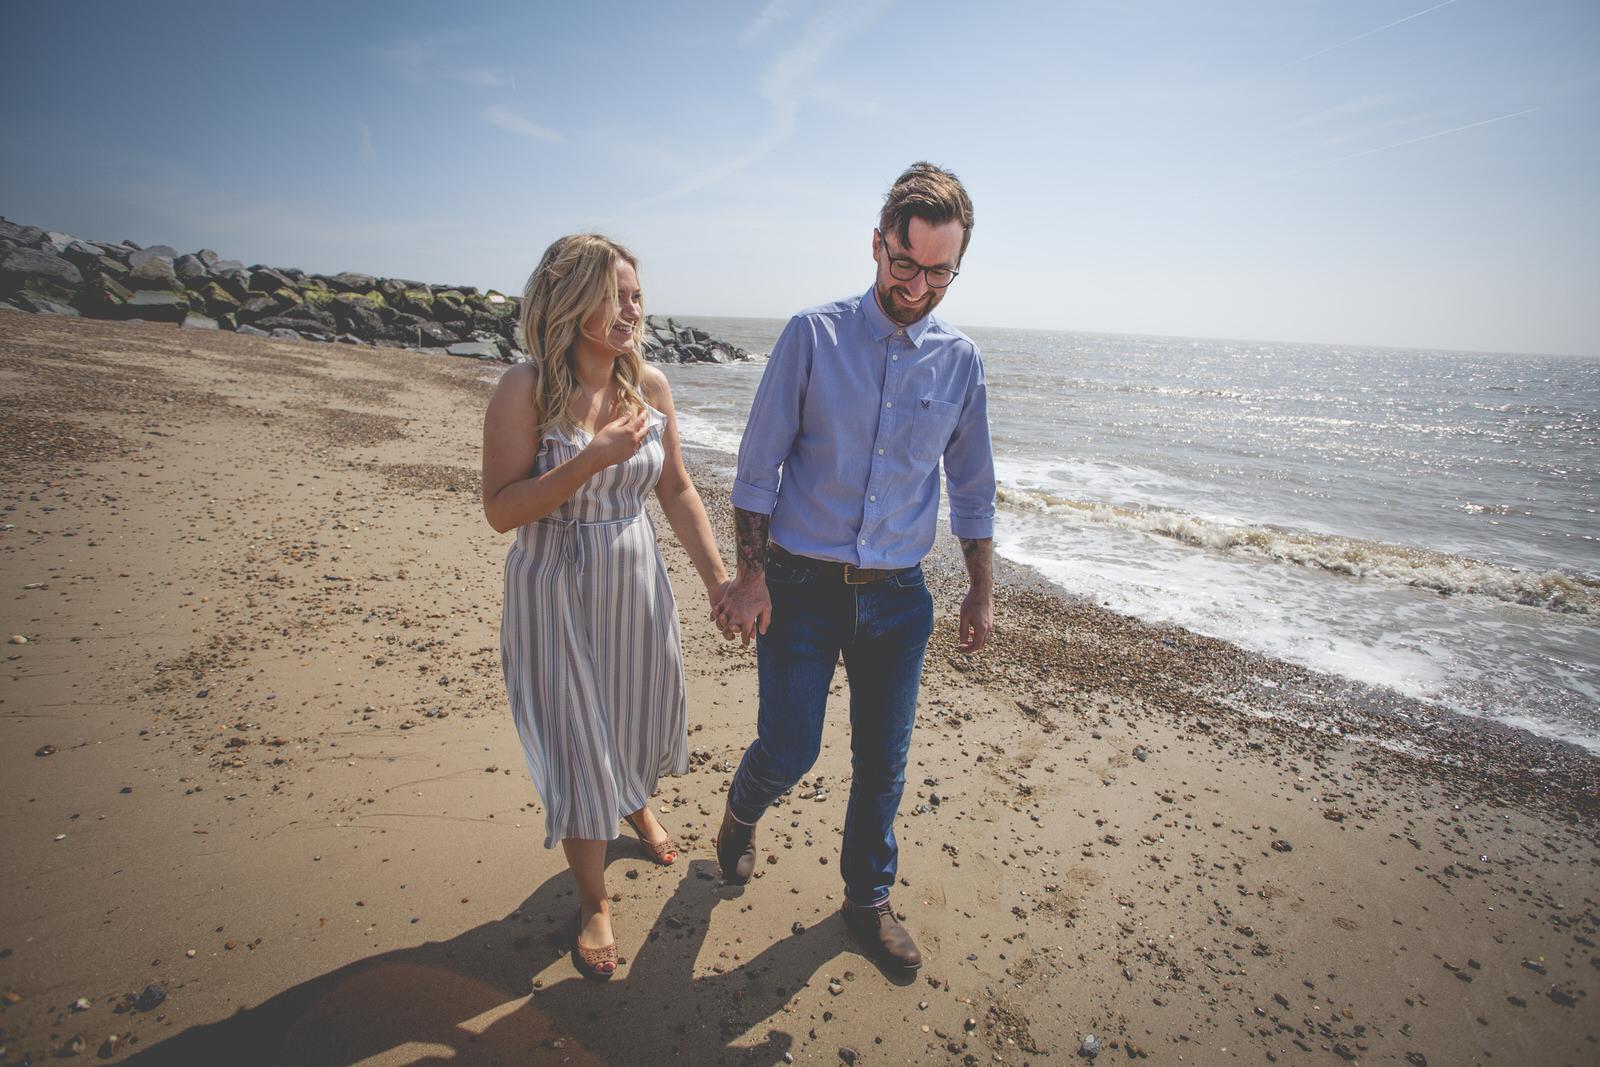 Felixstowe Beachfront Engagement - Sinead  Ryan - 019.jpg